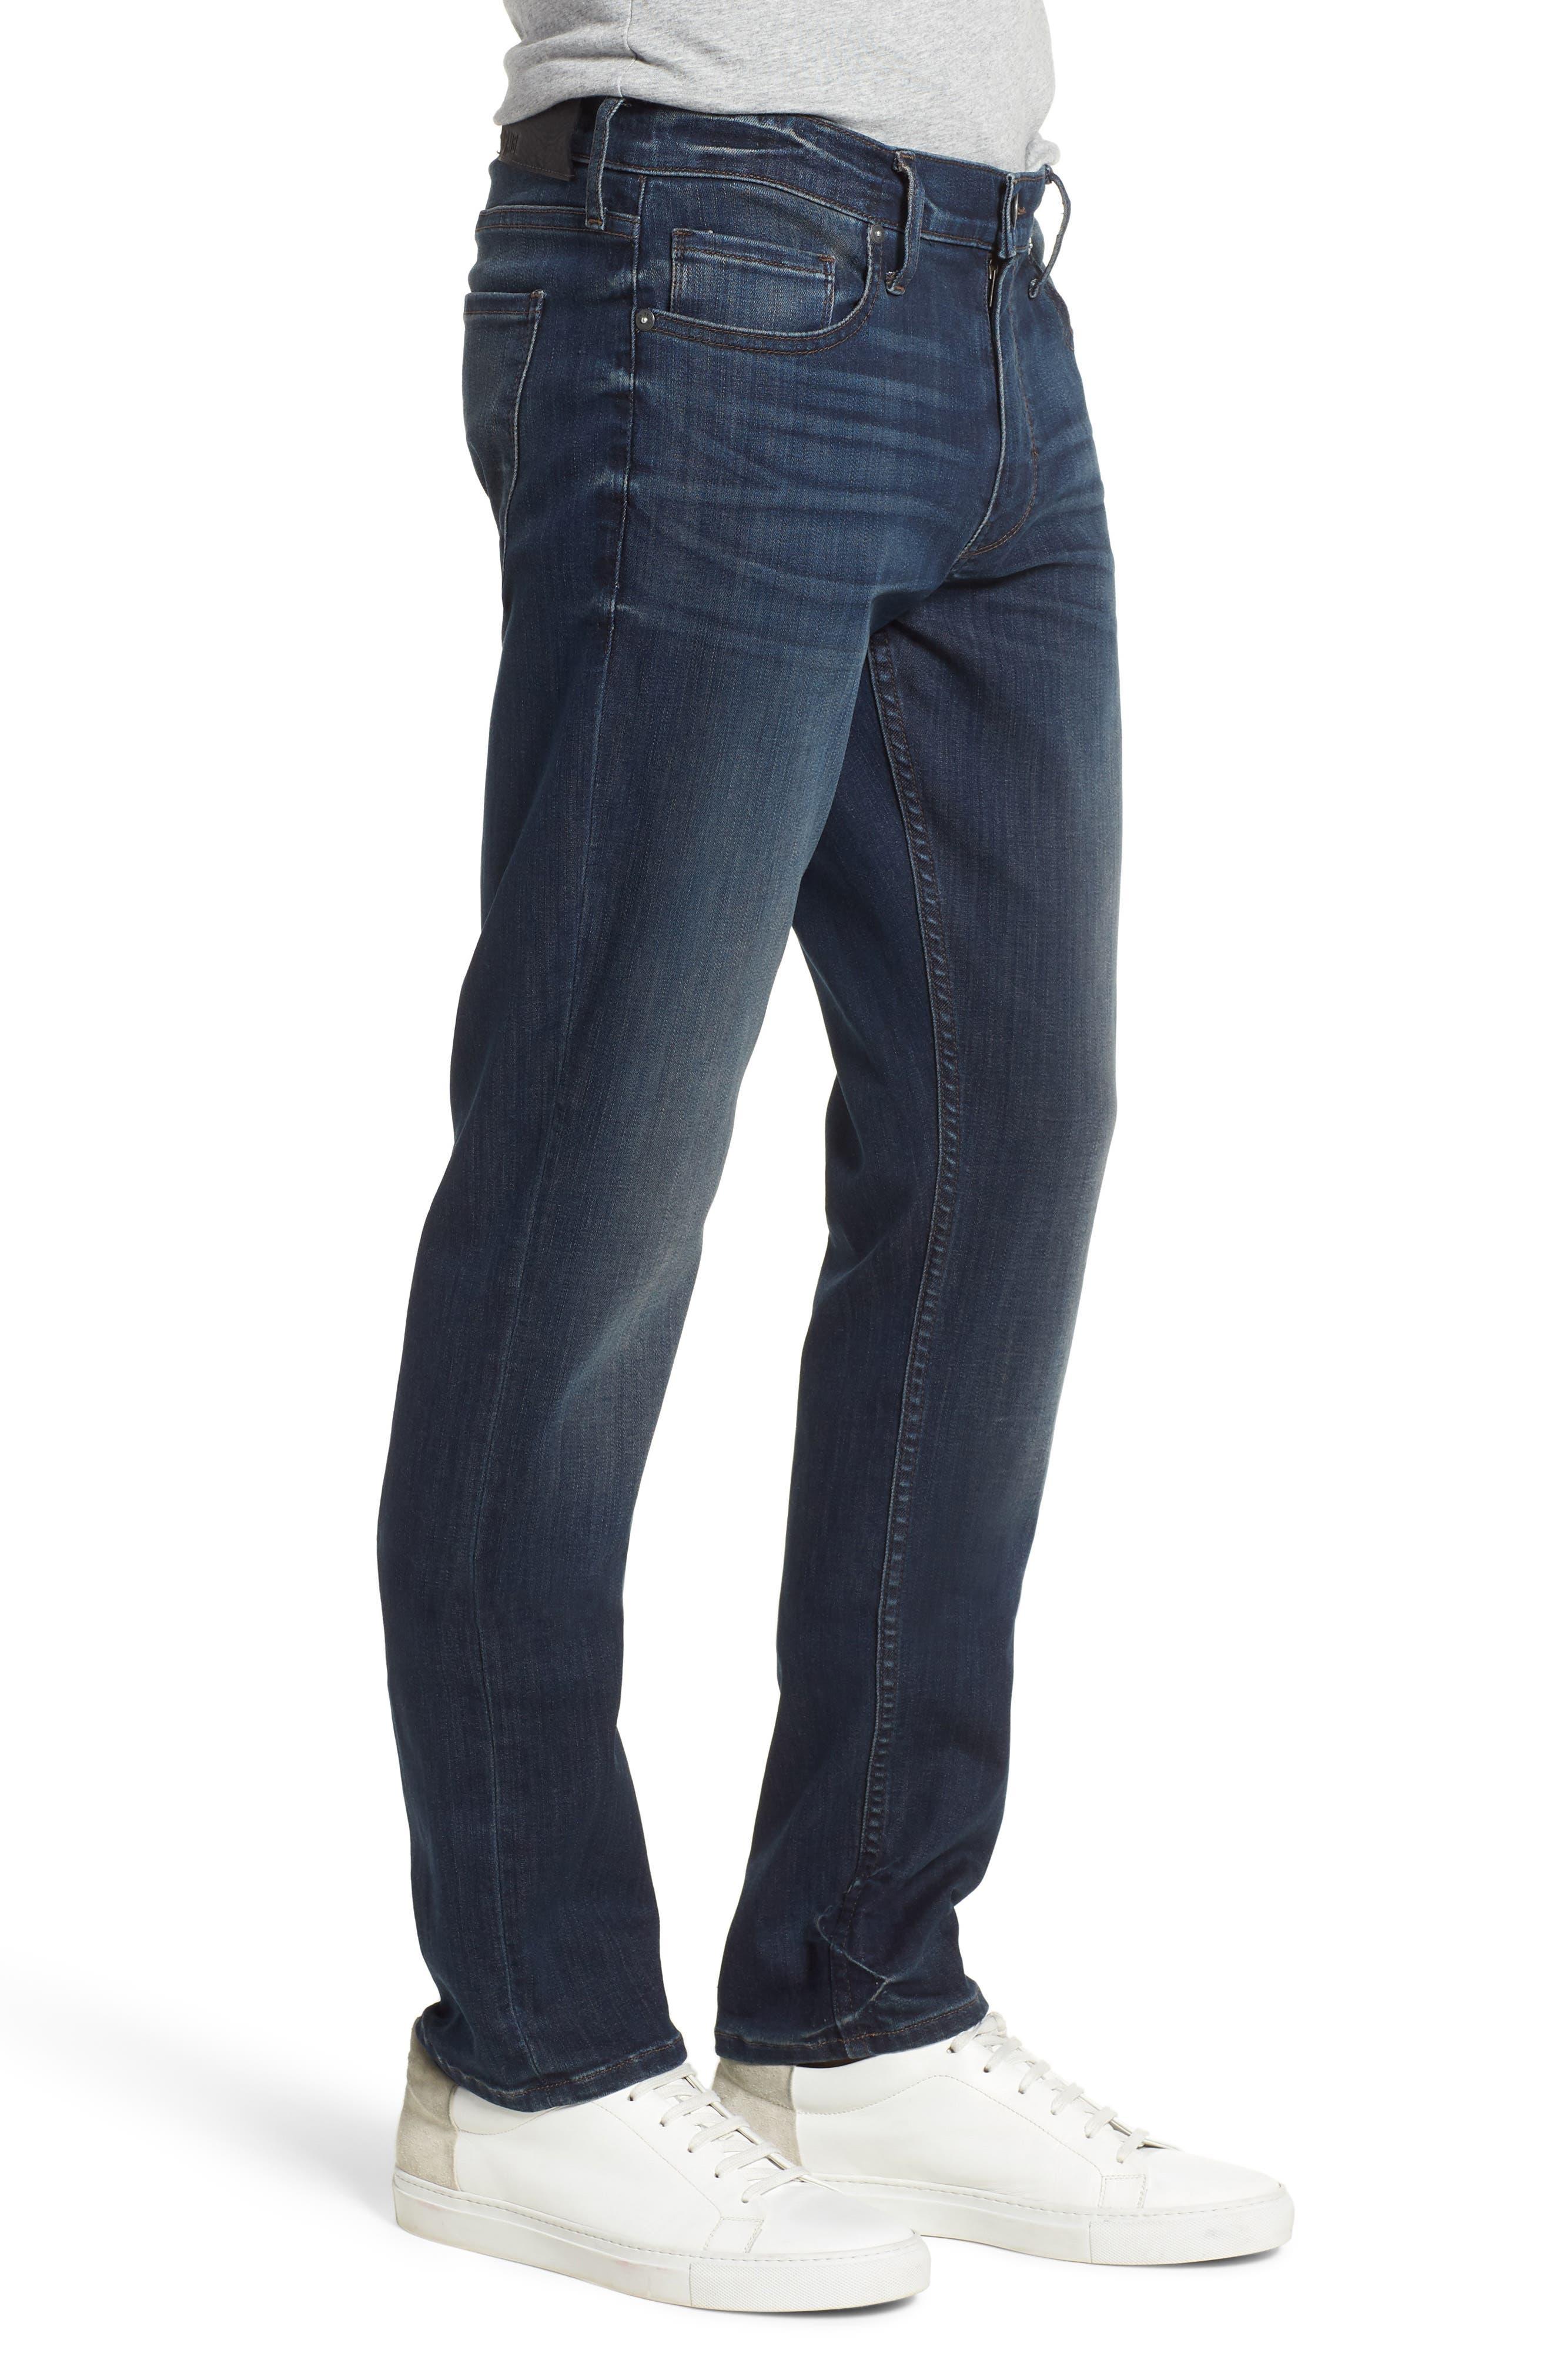 Transcend - Lennox Slim Fit Jeans,                             Alternate thumbnail 3, color,                             Freeman